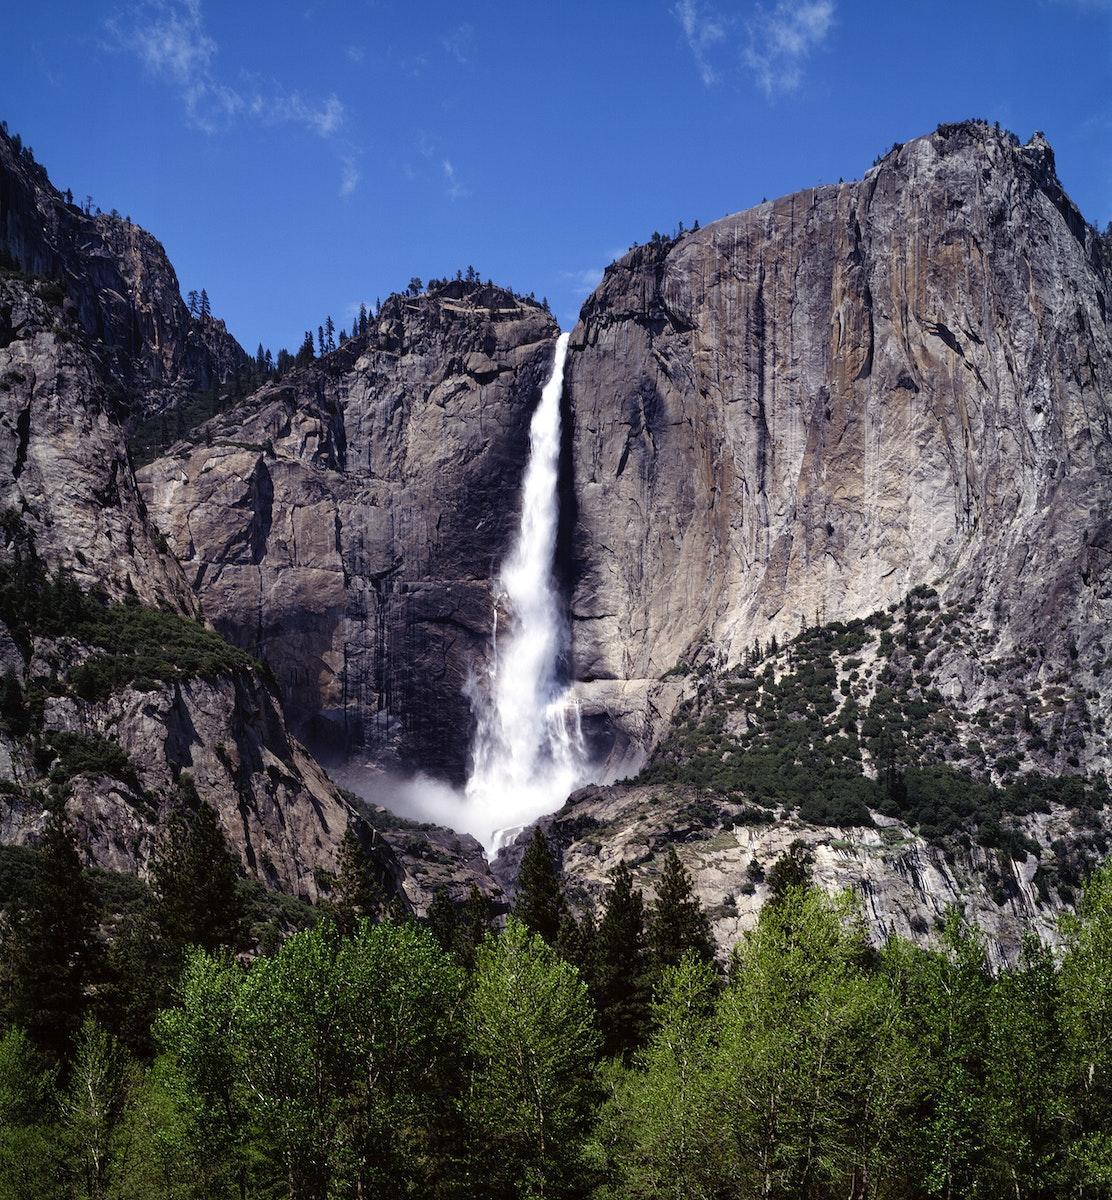 Spectacular Yosemite Falls, Yosemite National Park. Original image from Carol M. Highsmith's America, Library of…